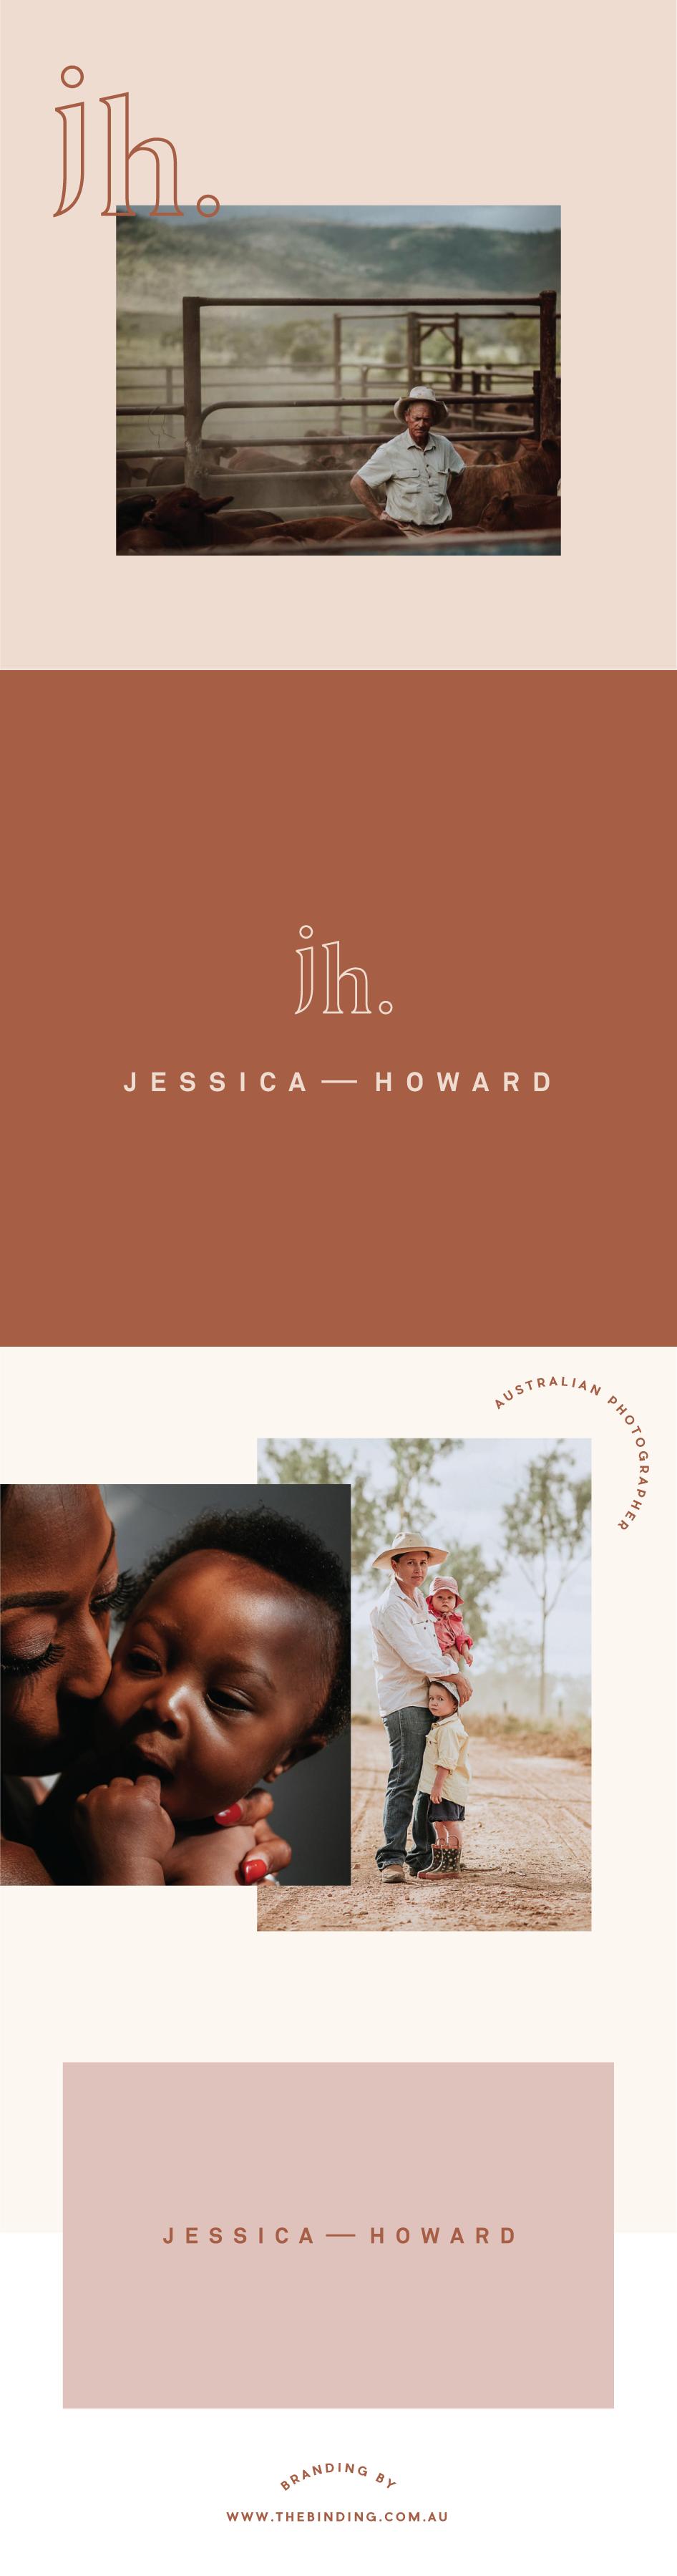 Jessica Howard Photographer Branding